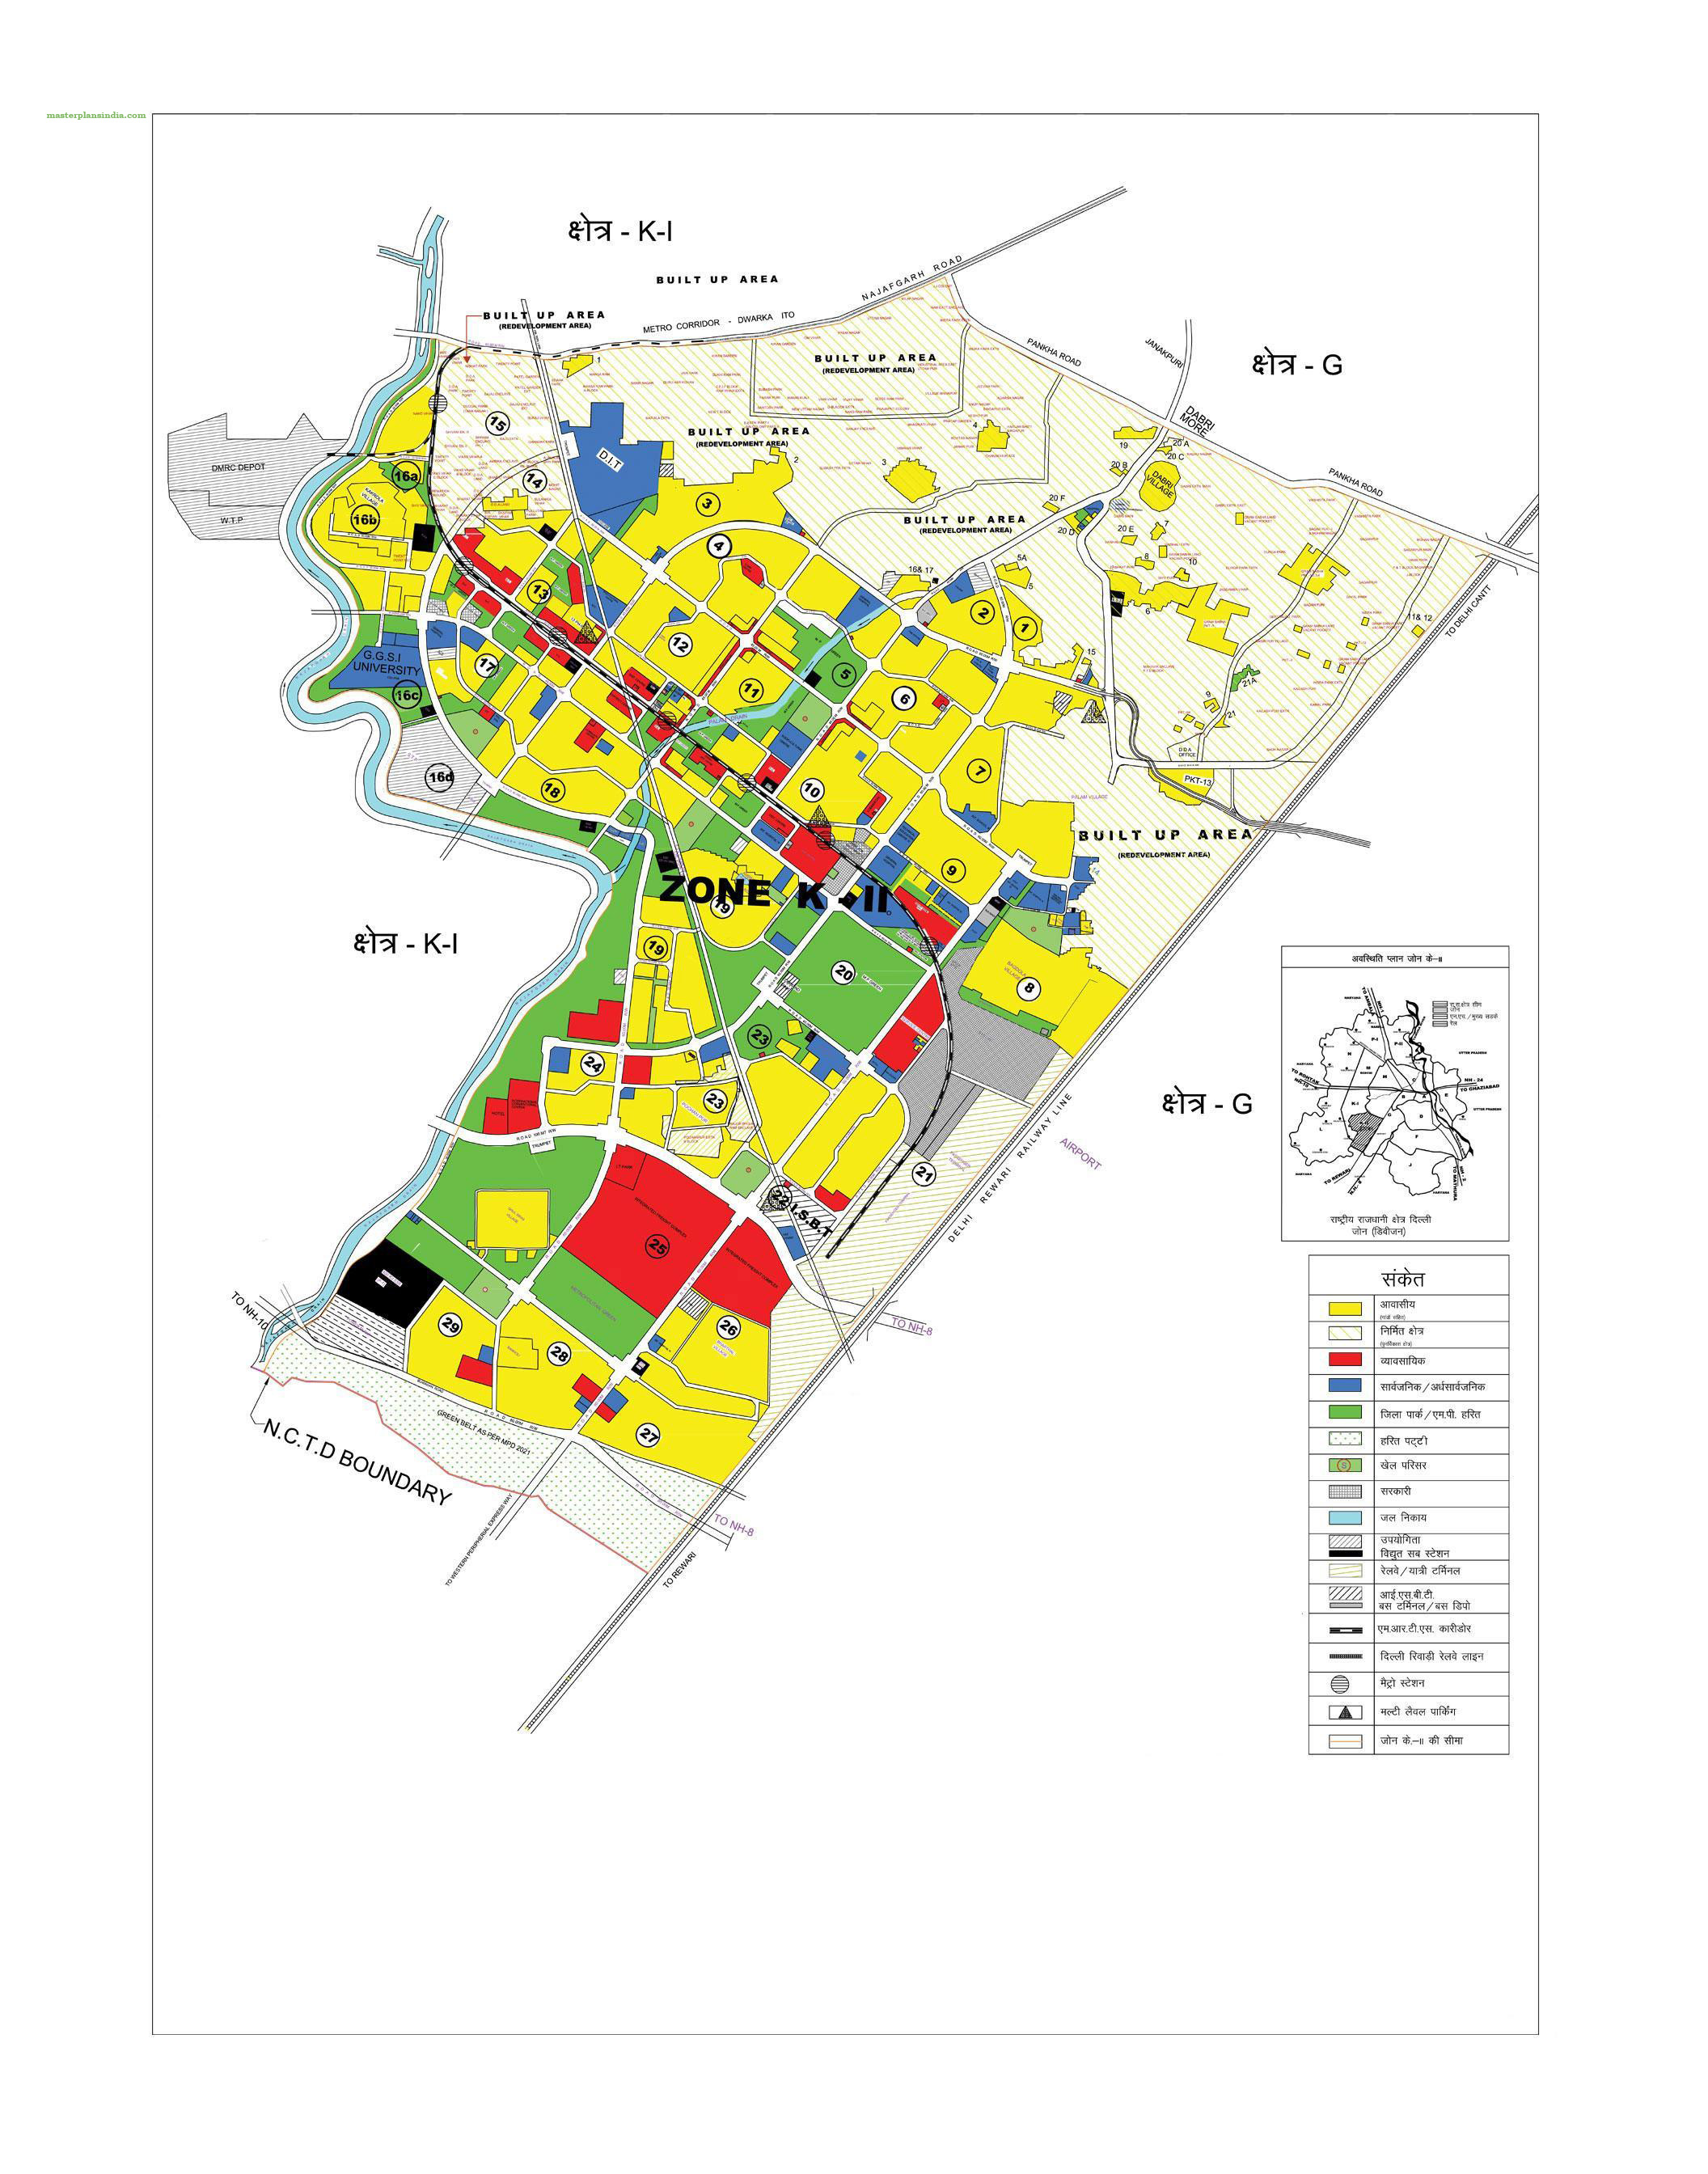 Zonal development plan map zone k2 west delhi 1 pdf for Zone plan